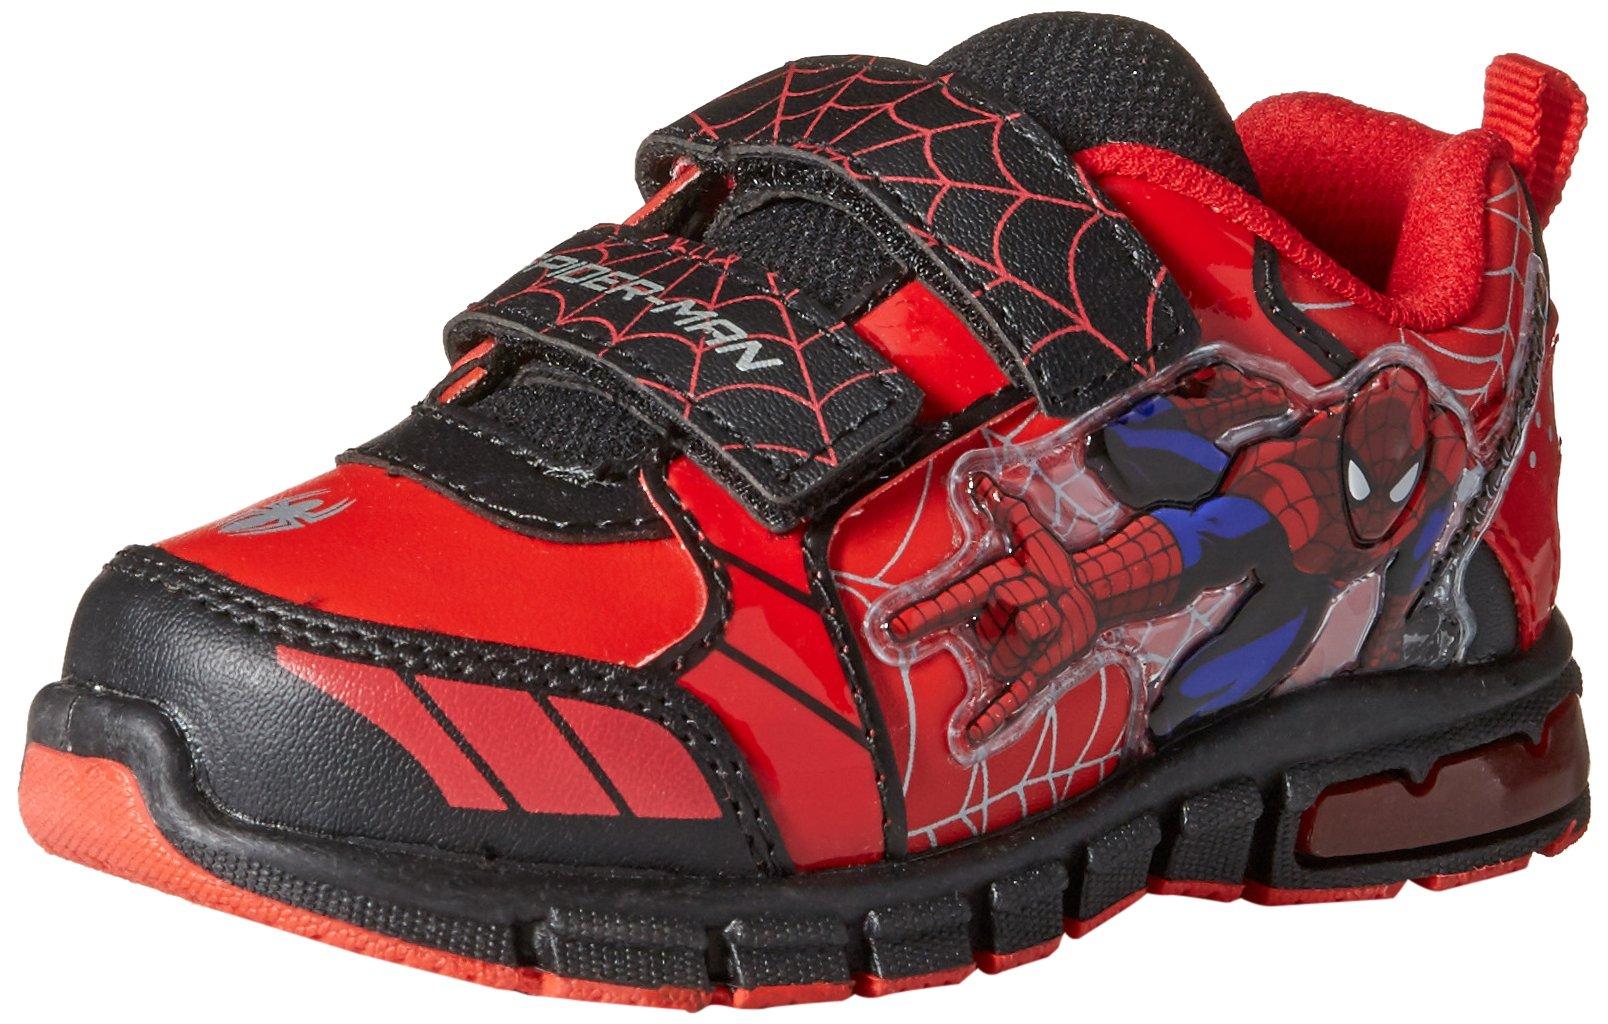 Marvel Ultimate Spiderman Shoes,Red/Black,7 M US Toddler